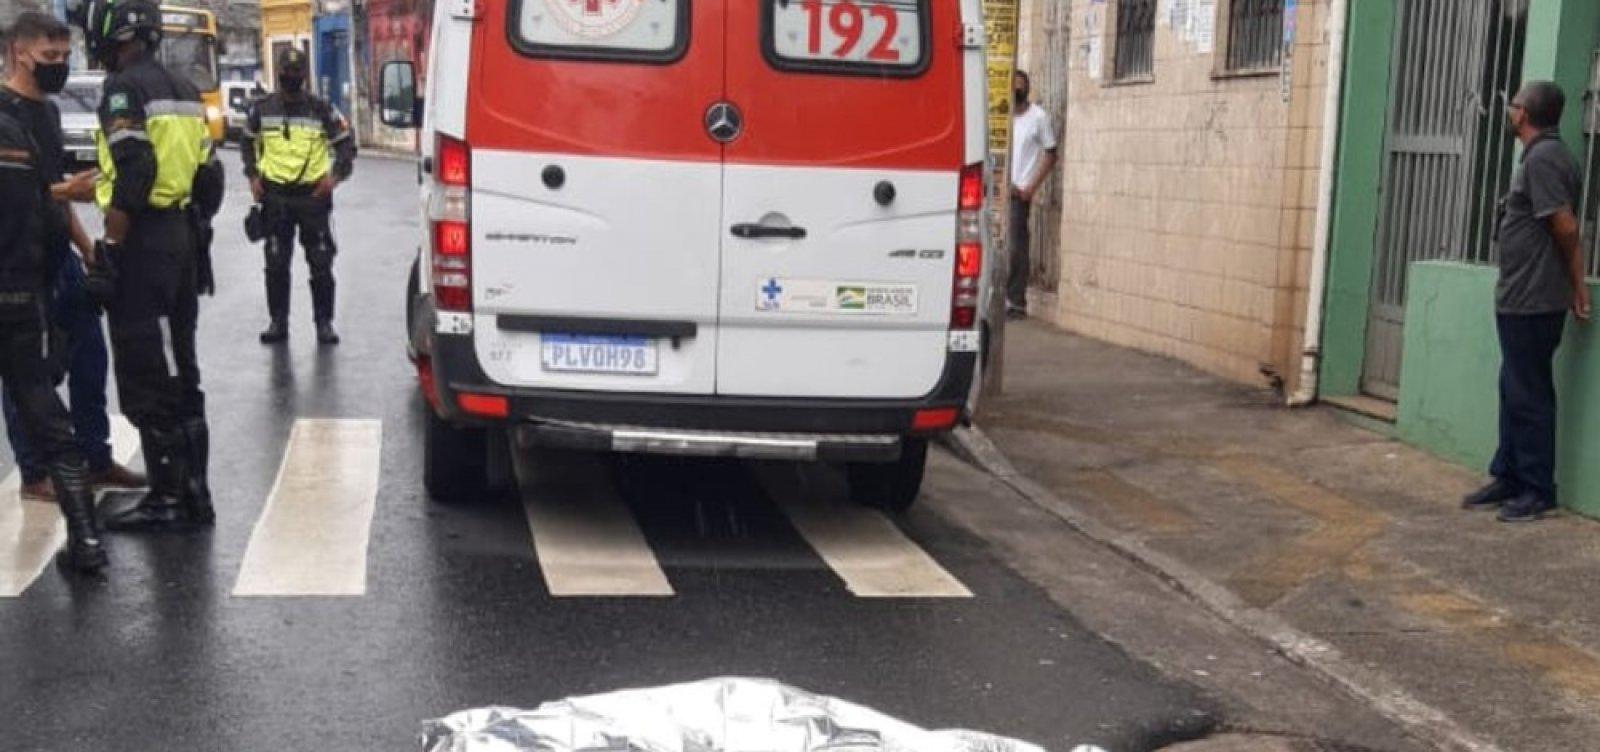 Idoso morre atropelado na Liberdade; vítima caiu sobre a faixa de pedestres